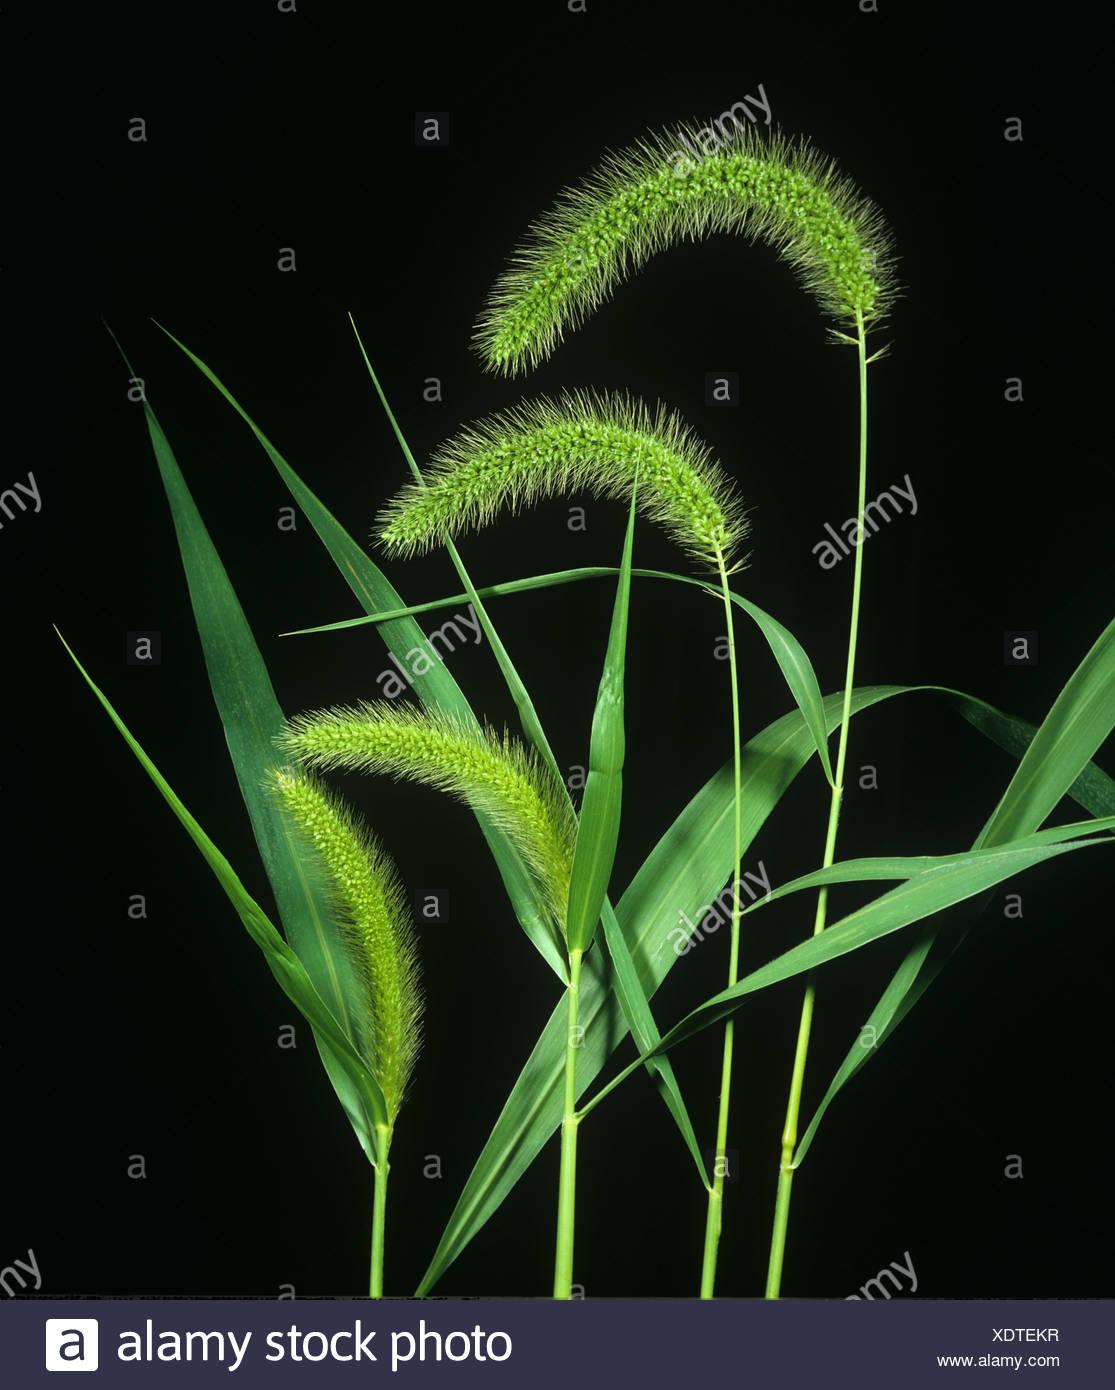 Sétaire verte Setaria faberi fleurs de mauvaises herbes graminées Photo Stock